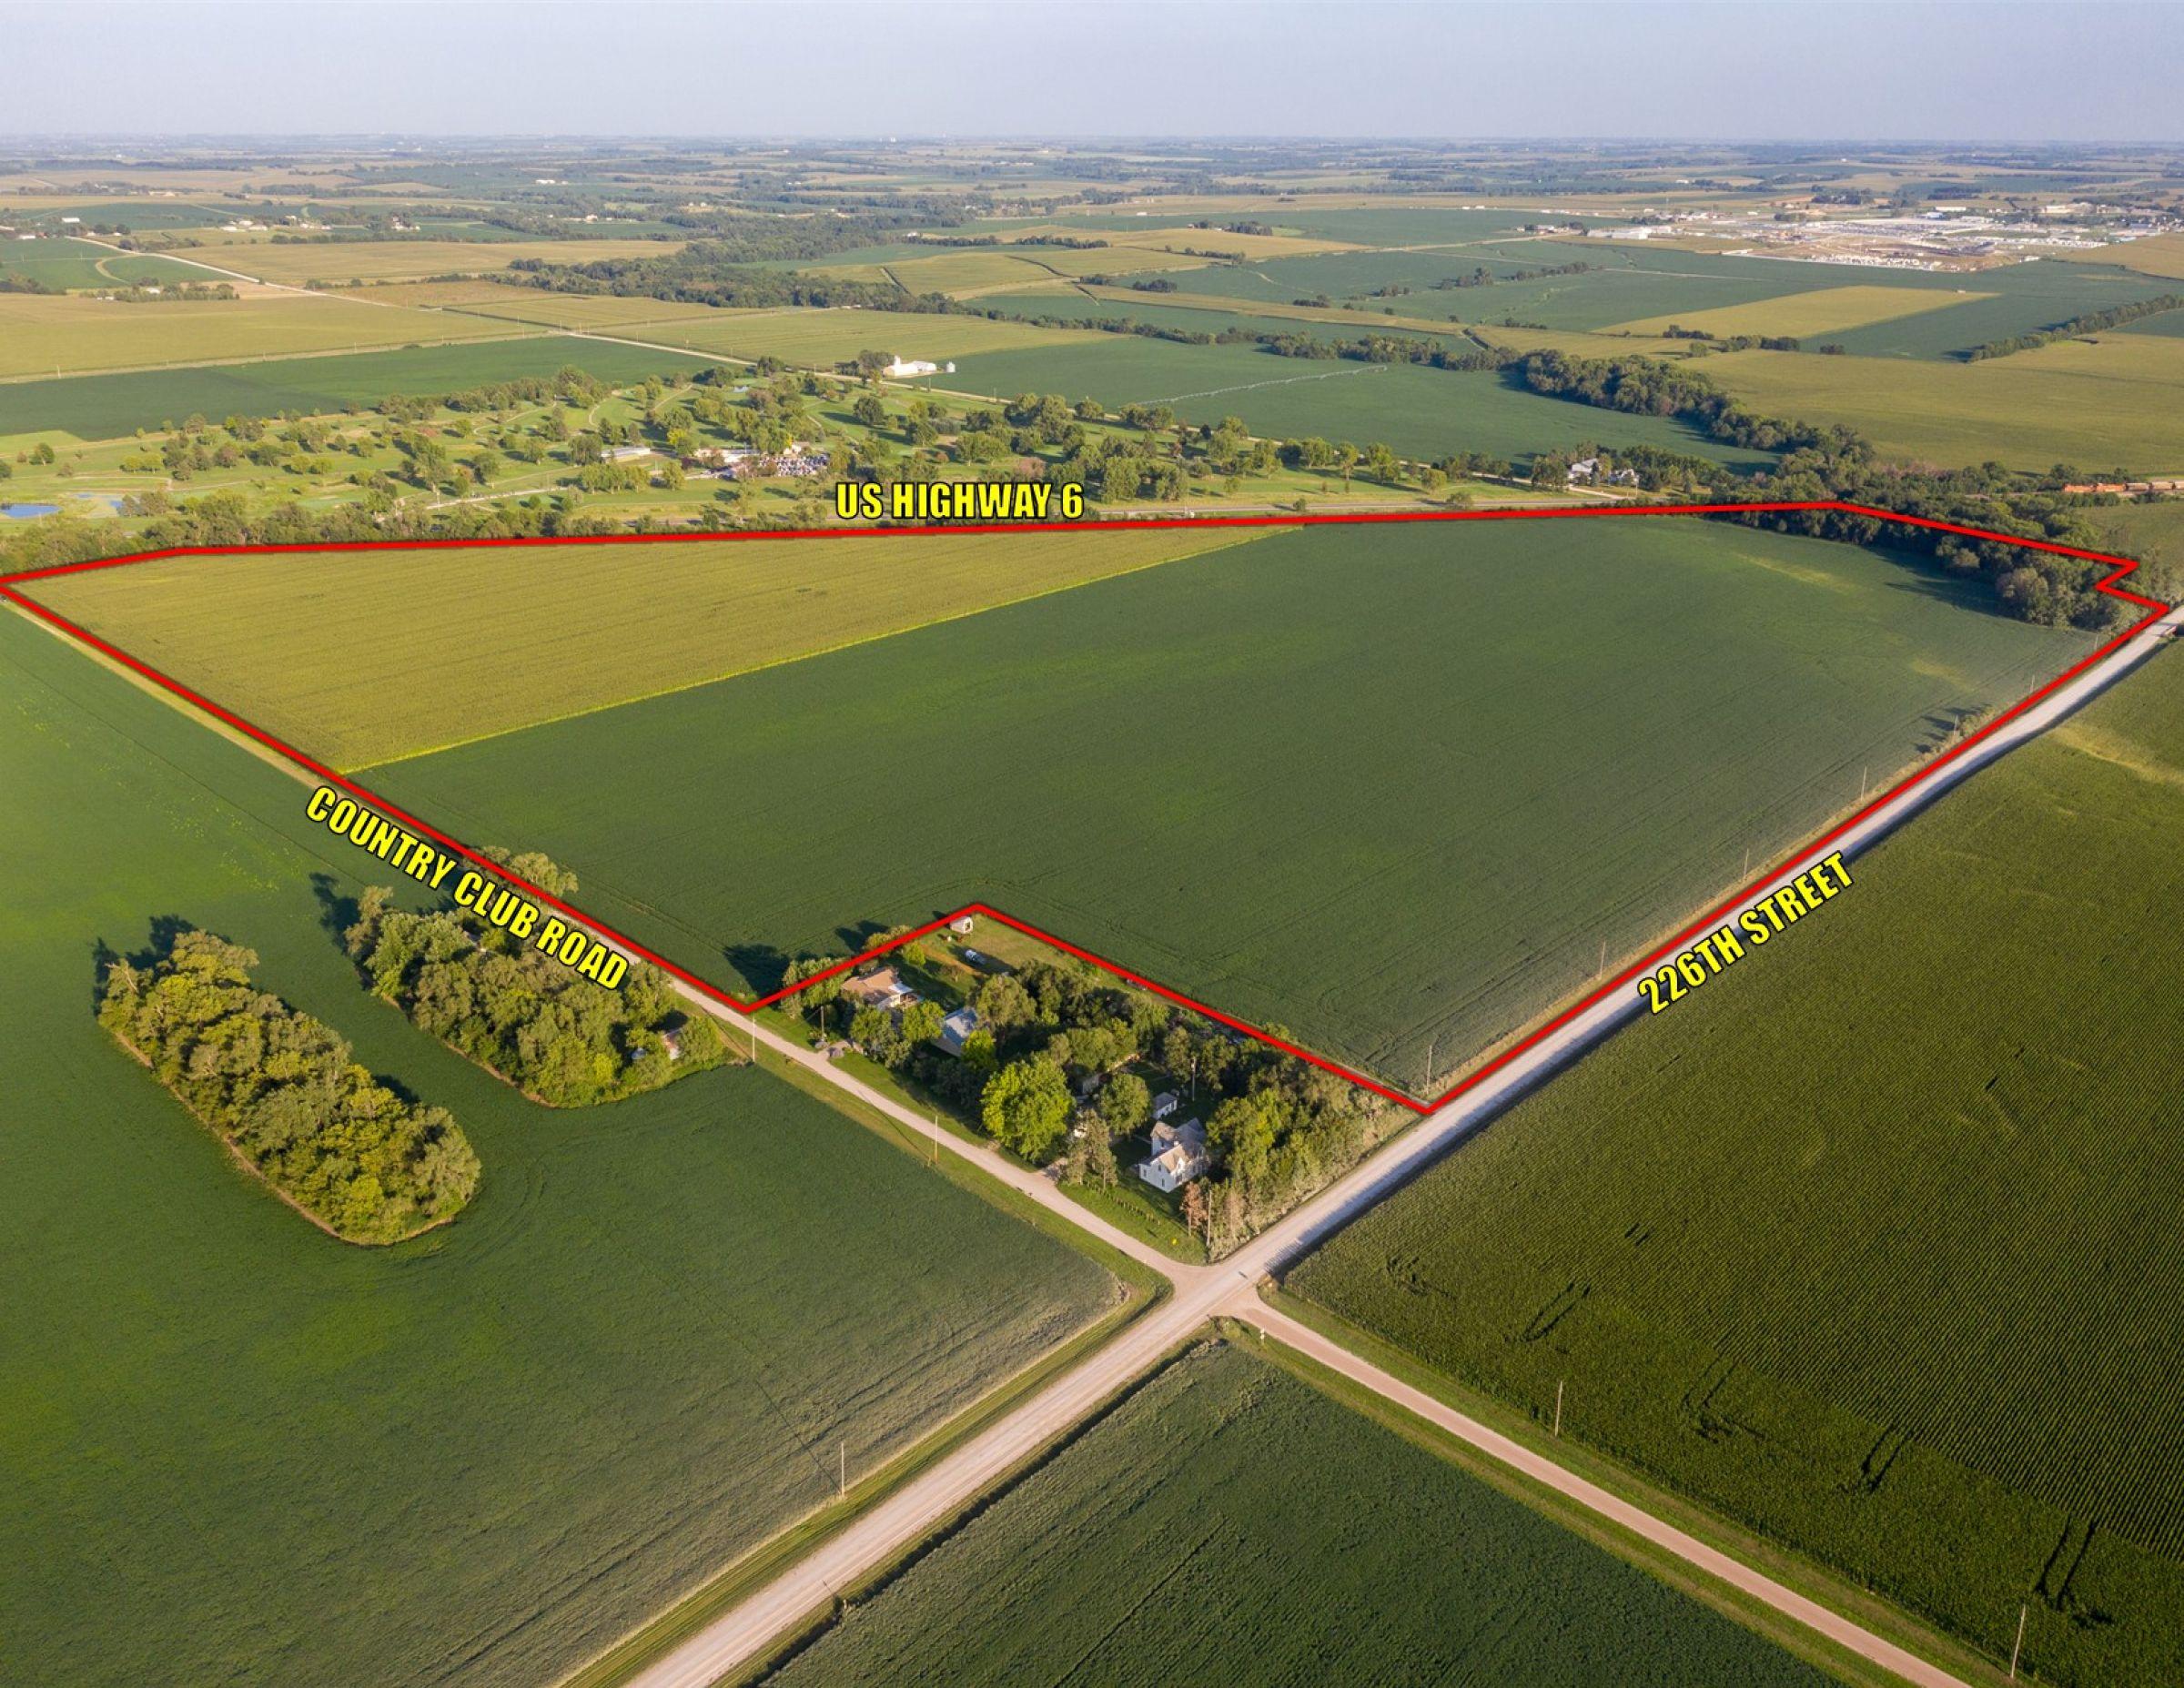 auctions-land-cass-county-nebraska-107-acres-listing-number-15713-1-2021-09-02-173144.jpg